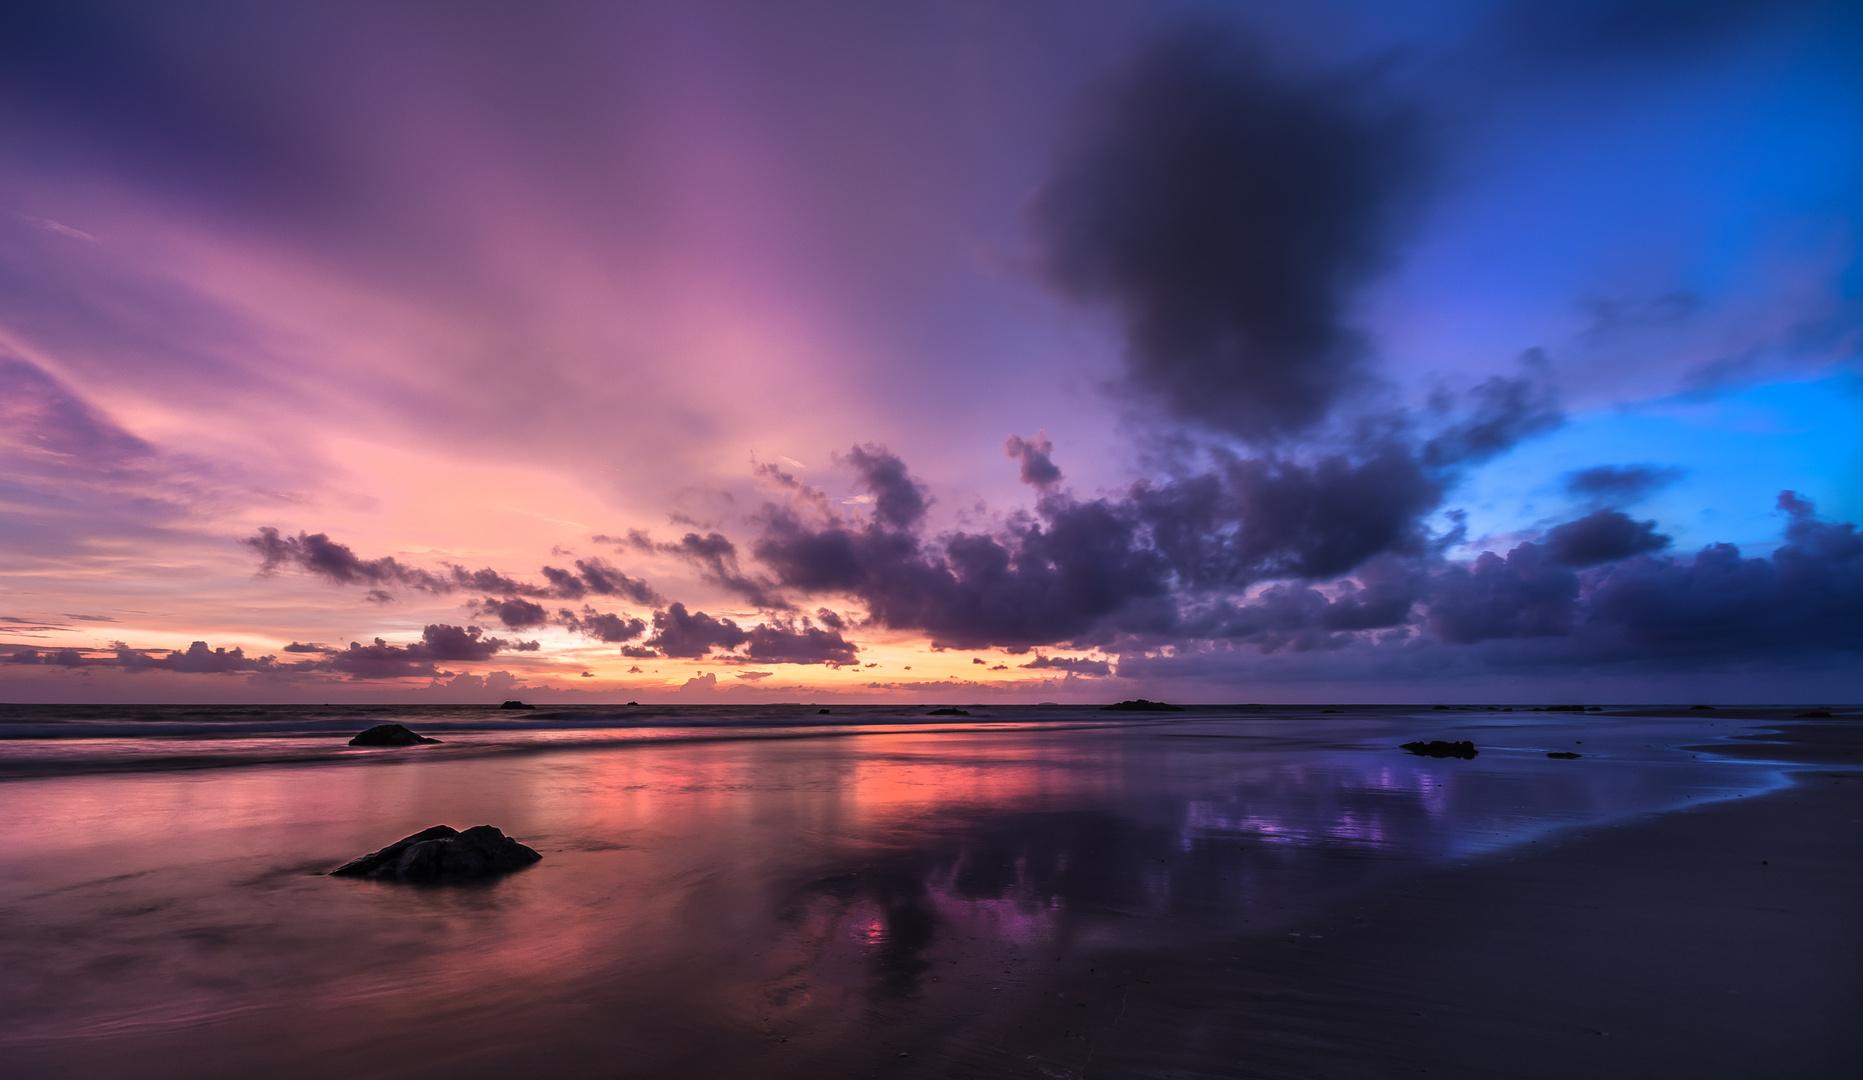 Burma - Ngwe Saung Beach